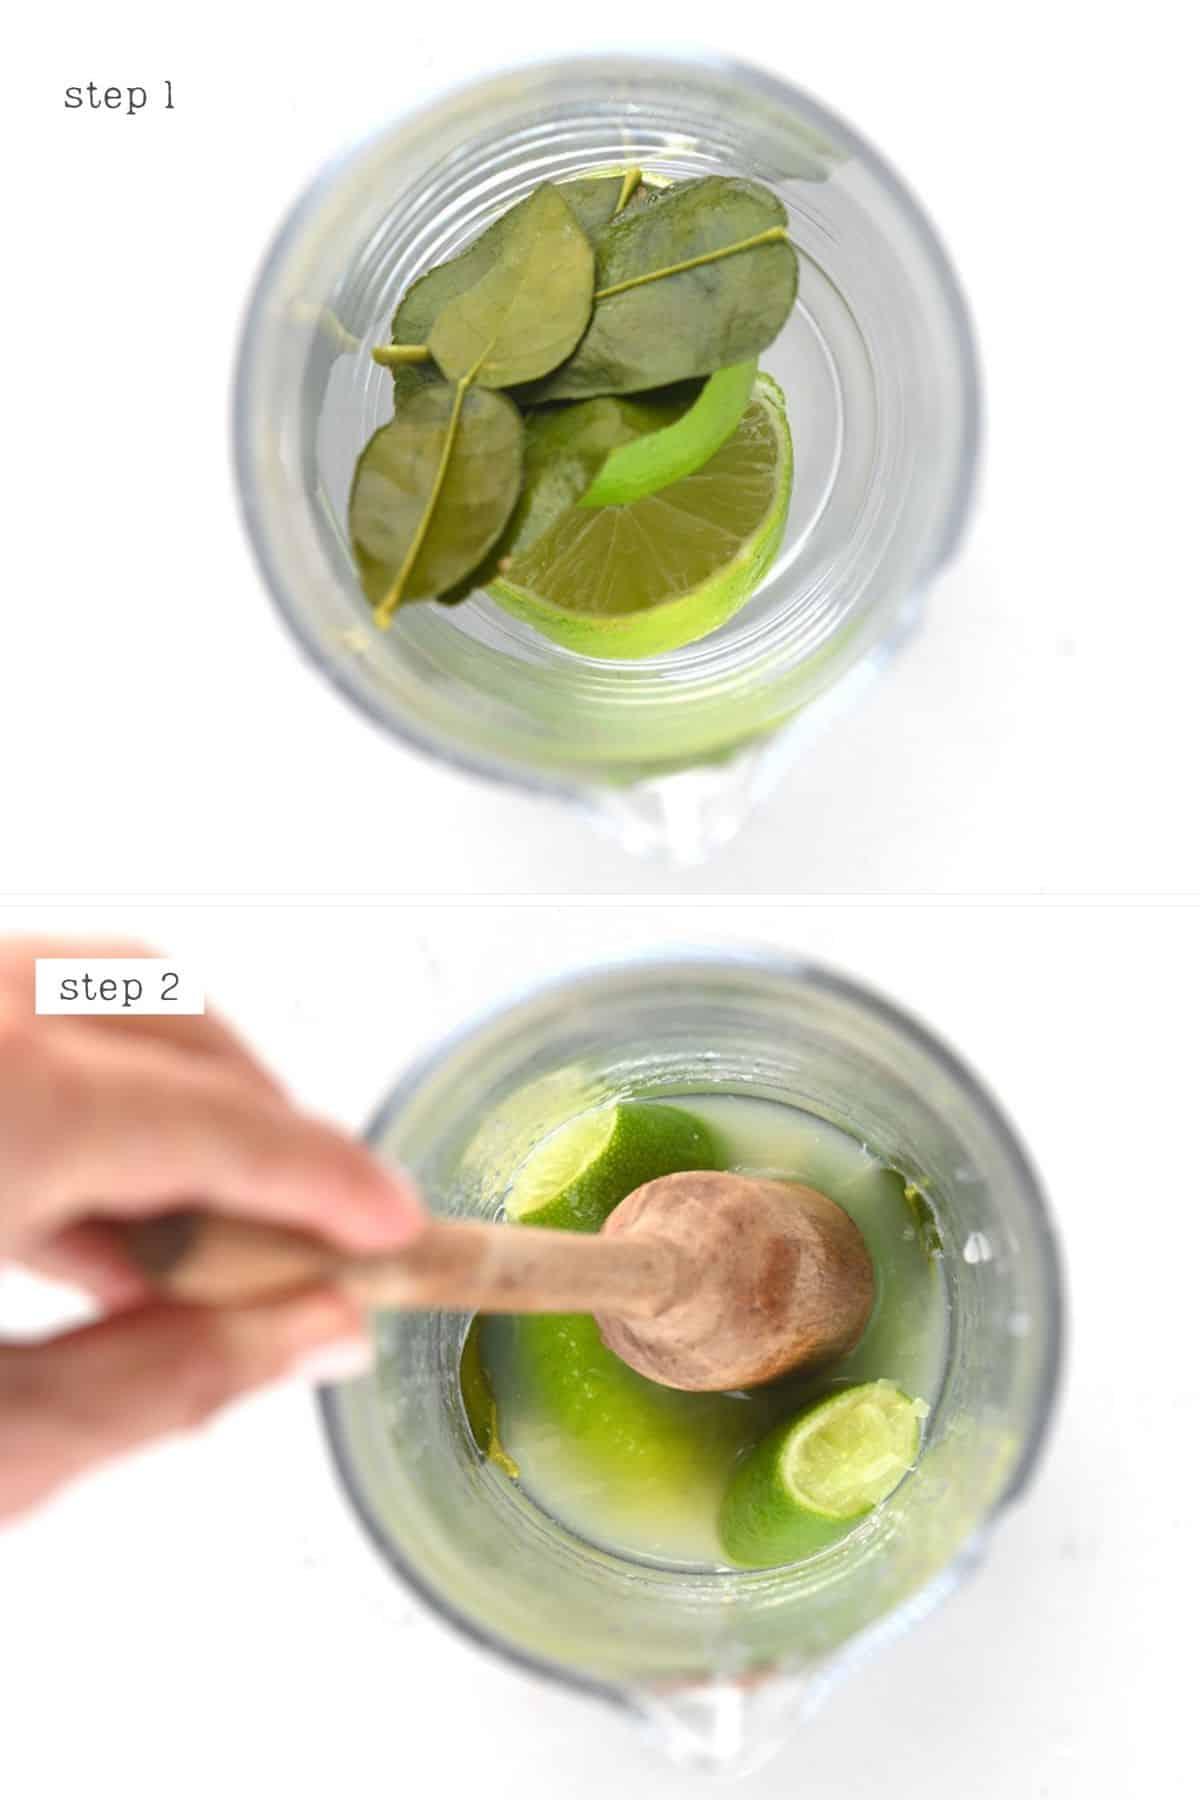 Steps to muddle lemon